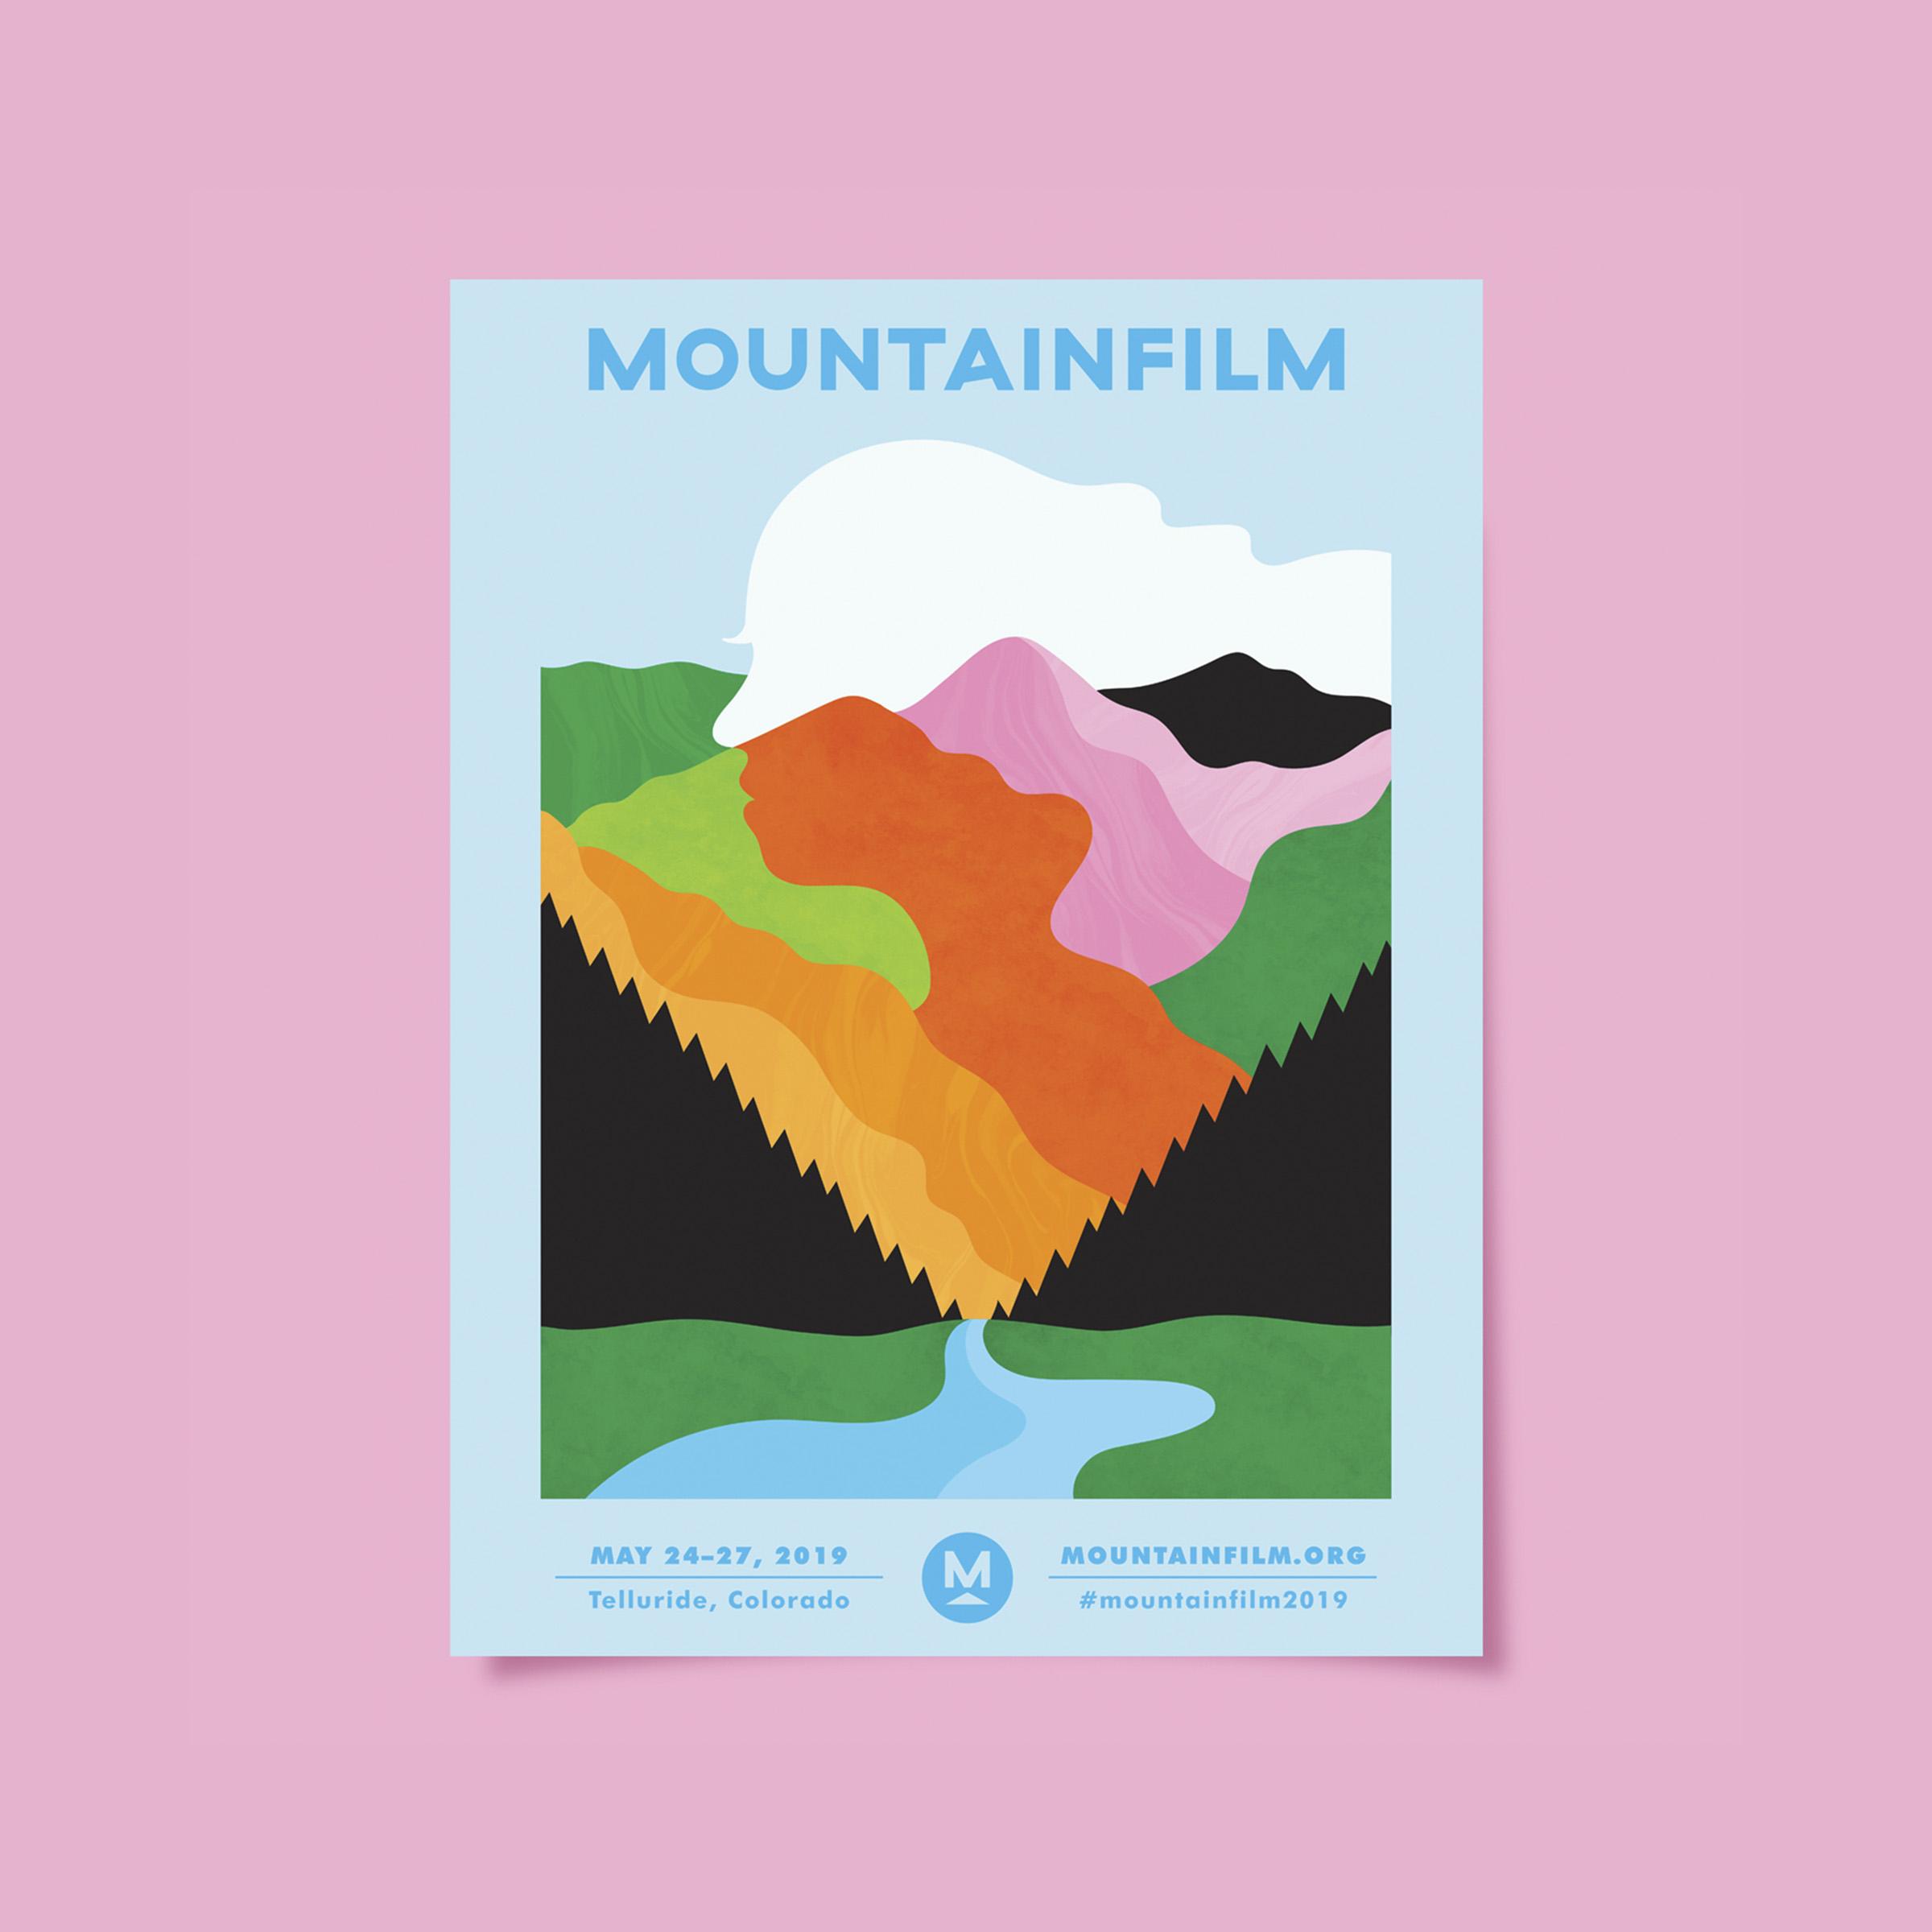 mountainfilm_poster2019